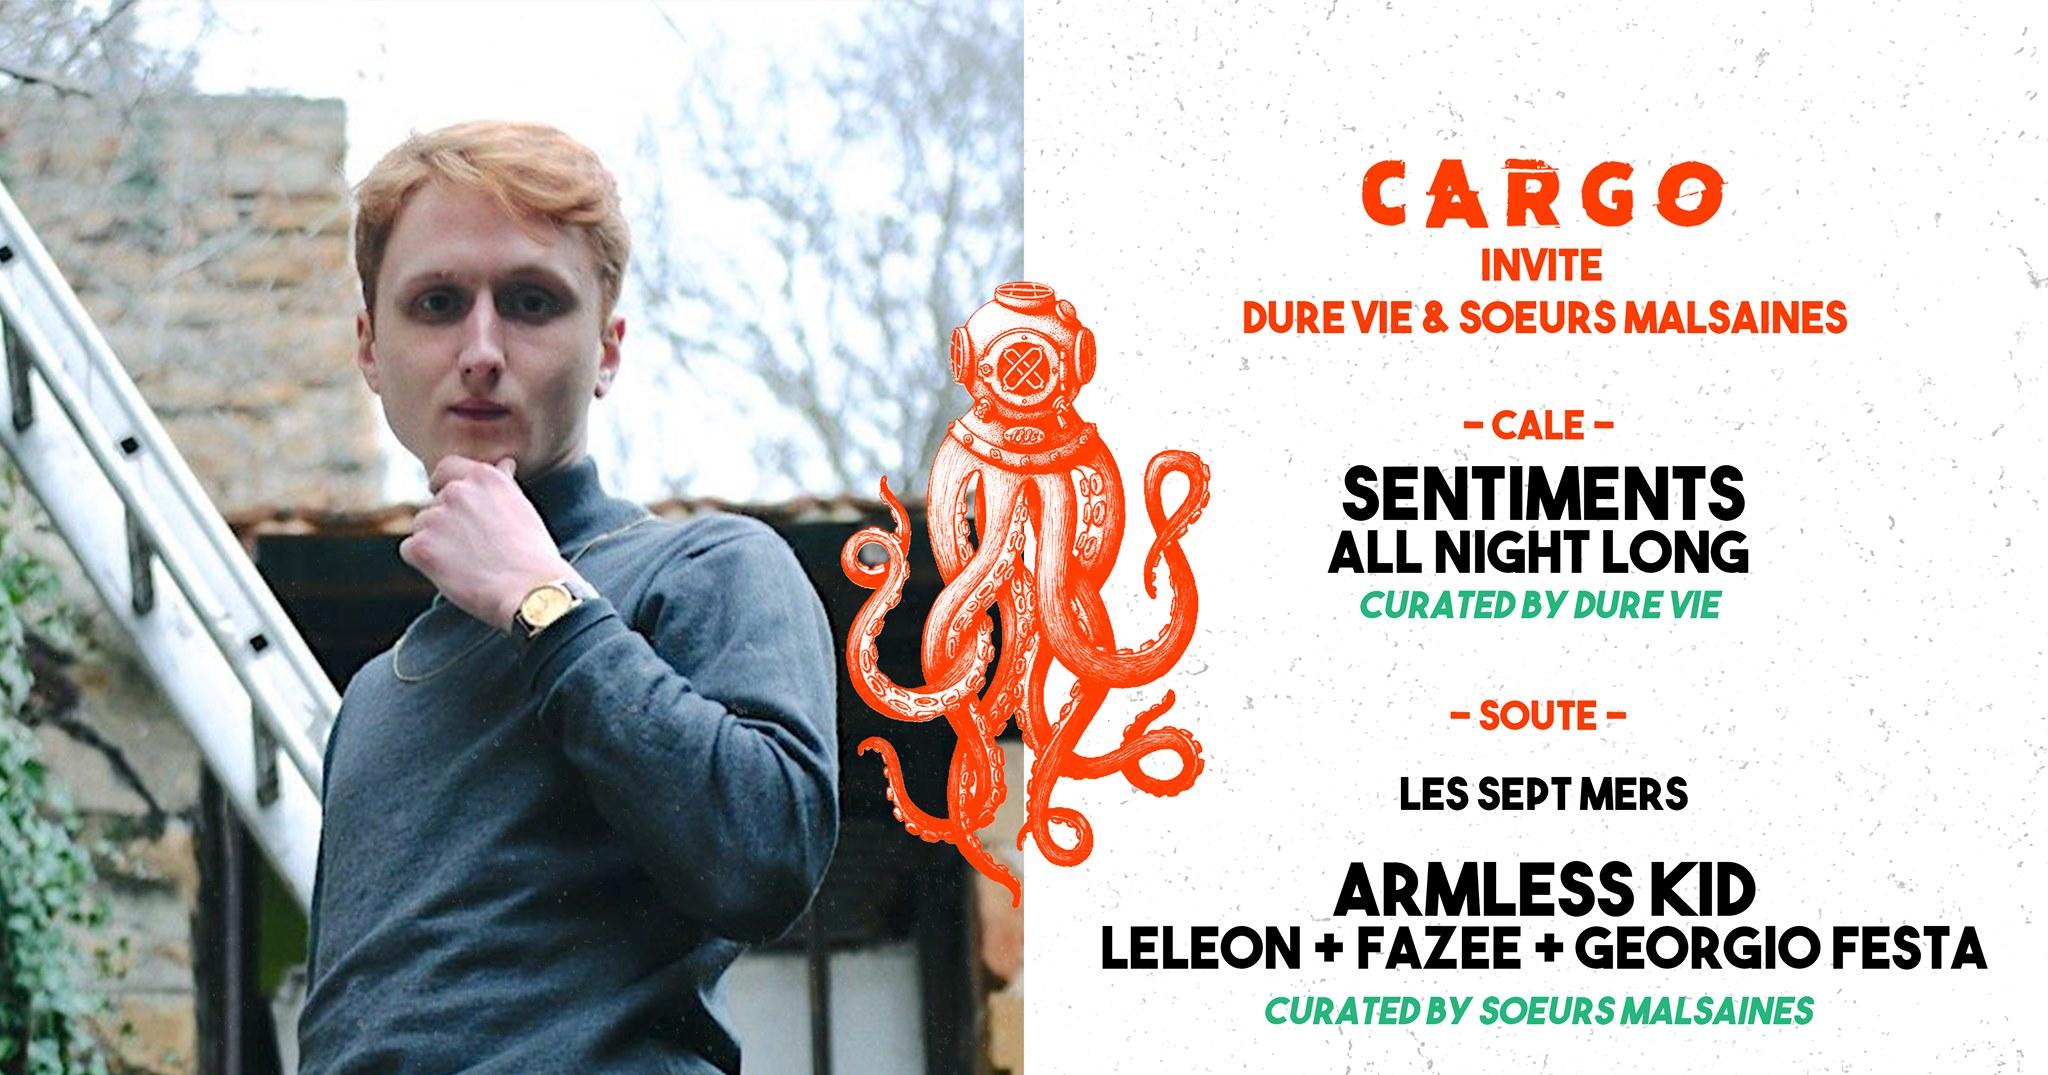 CARGØ Closing : Dure Vie • Soeurs Malsaines • Sentiments all night long • Armless Kid